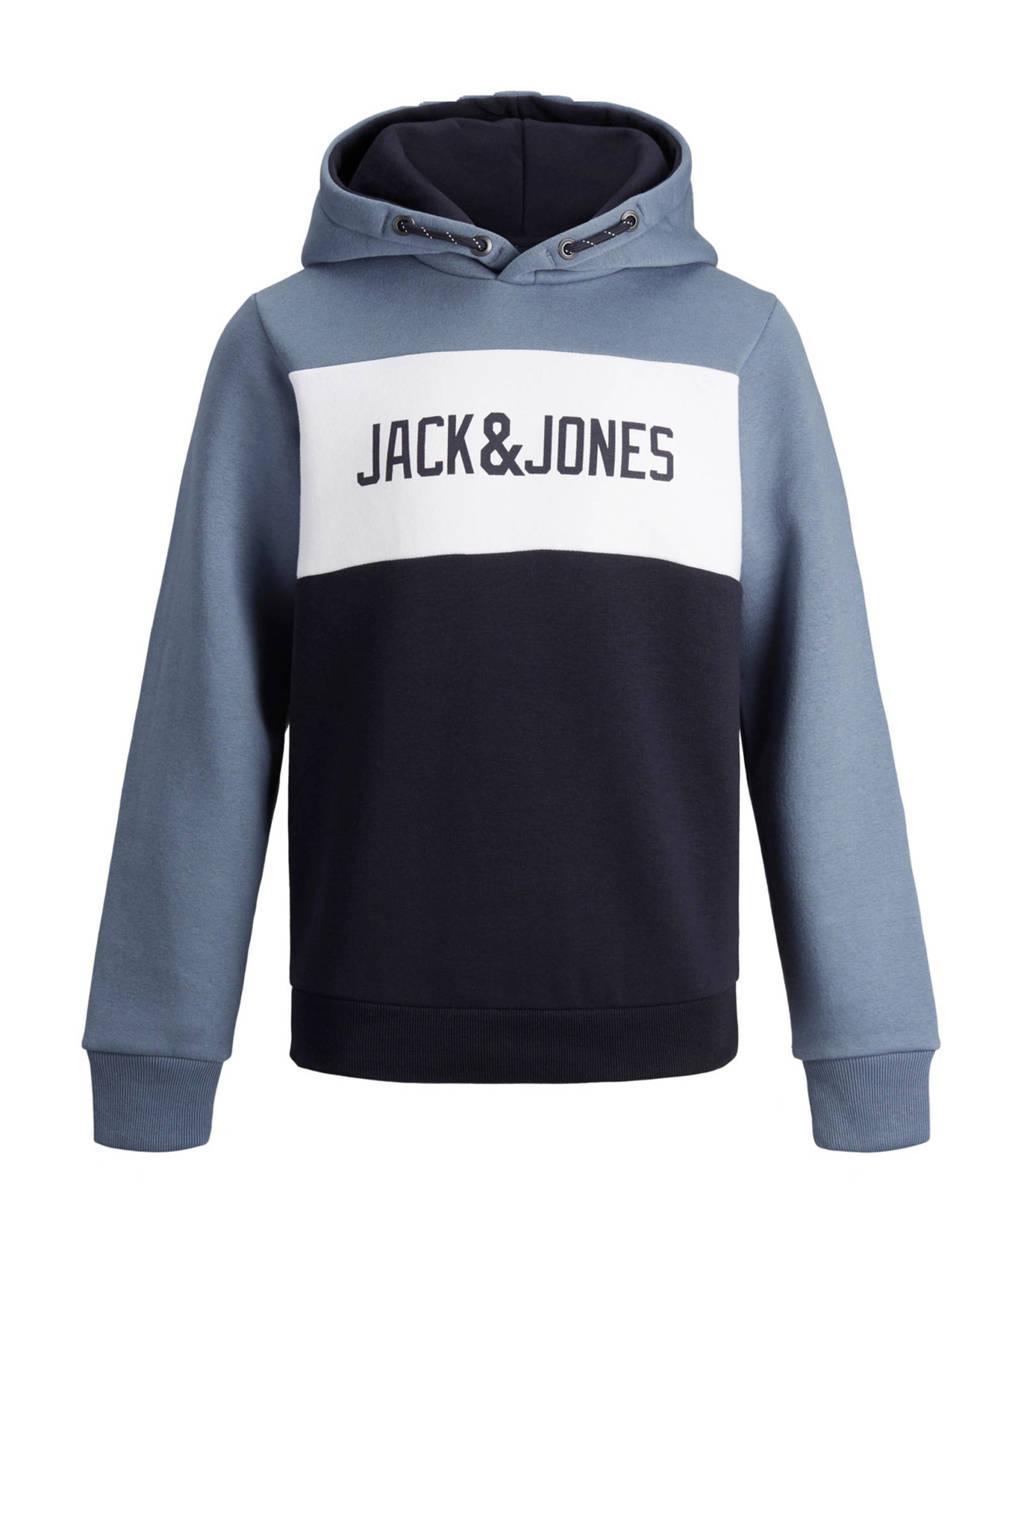 JACK & JONES JUNIOR hoodie JJELOGO met logo blauw/donkerblauw, Blauw/donkerblauw